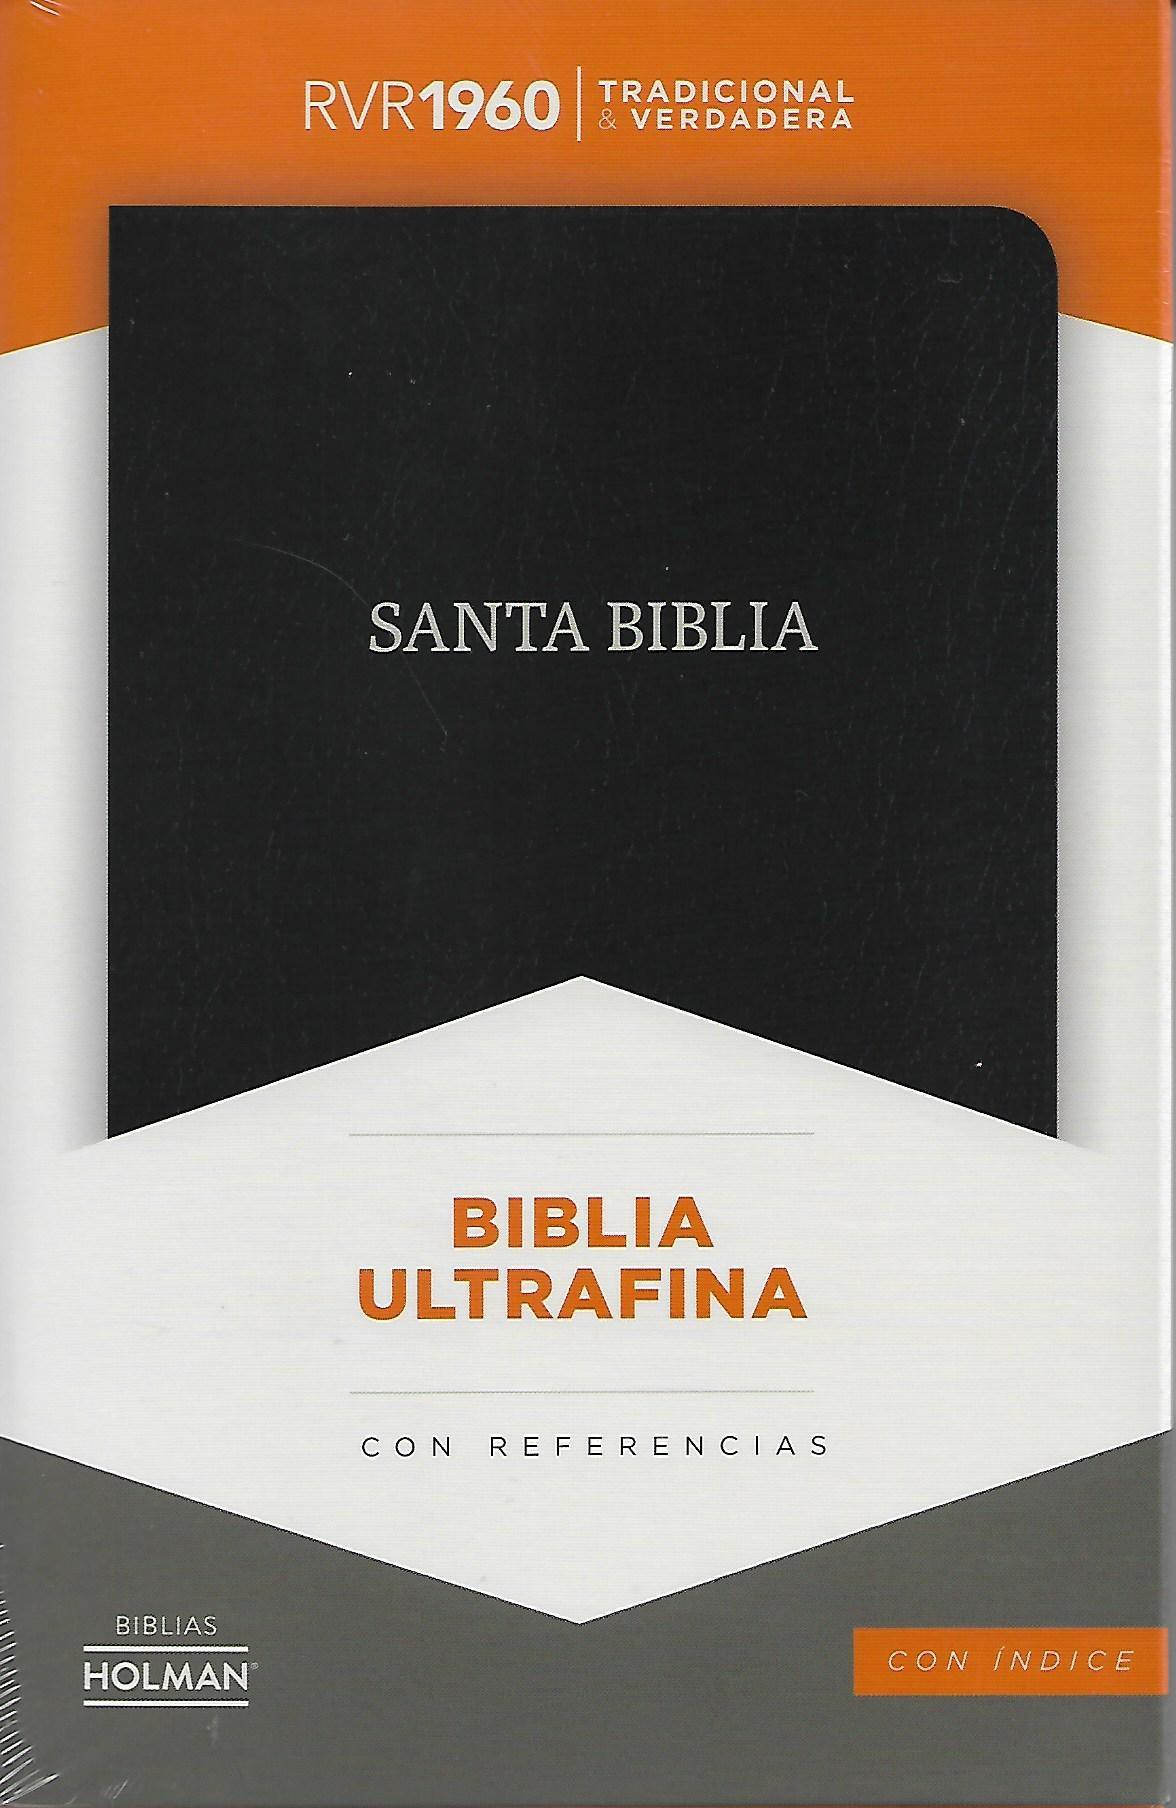 Biblia RVR1960 ultrafina con referencias con índice